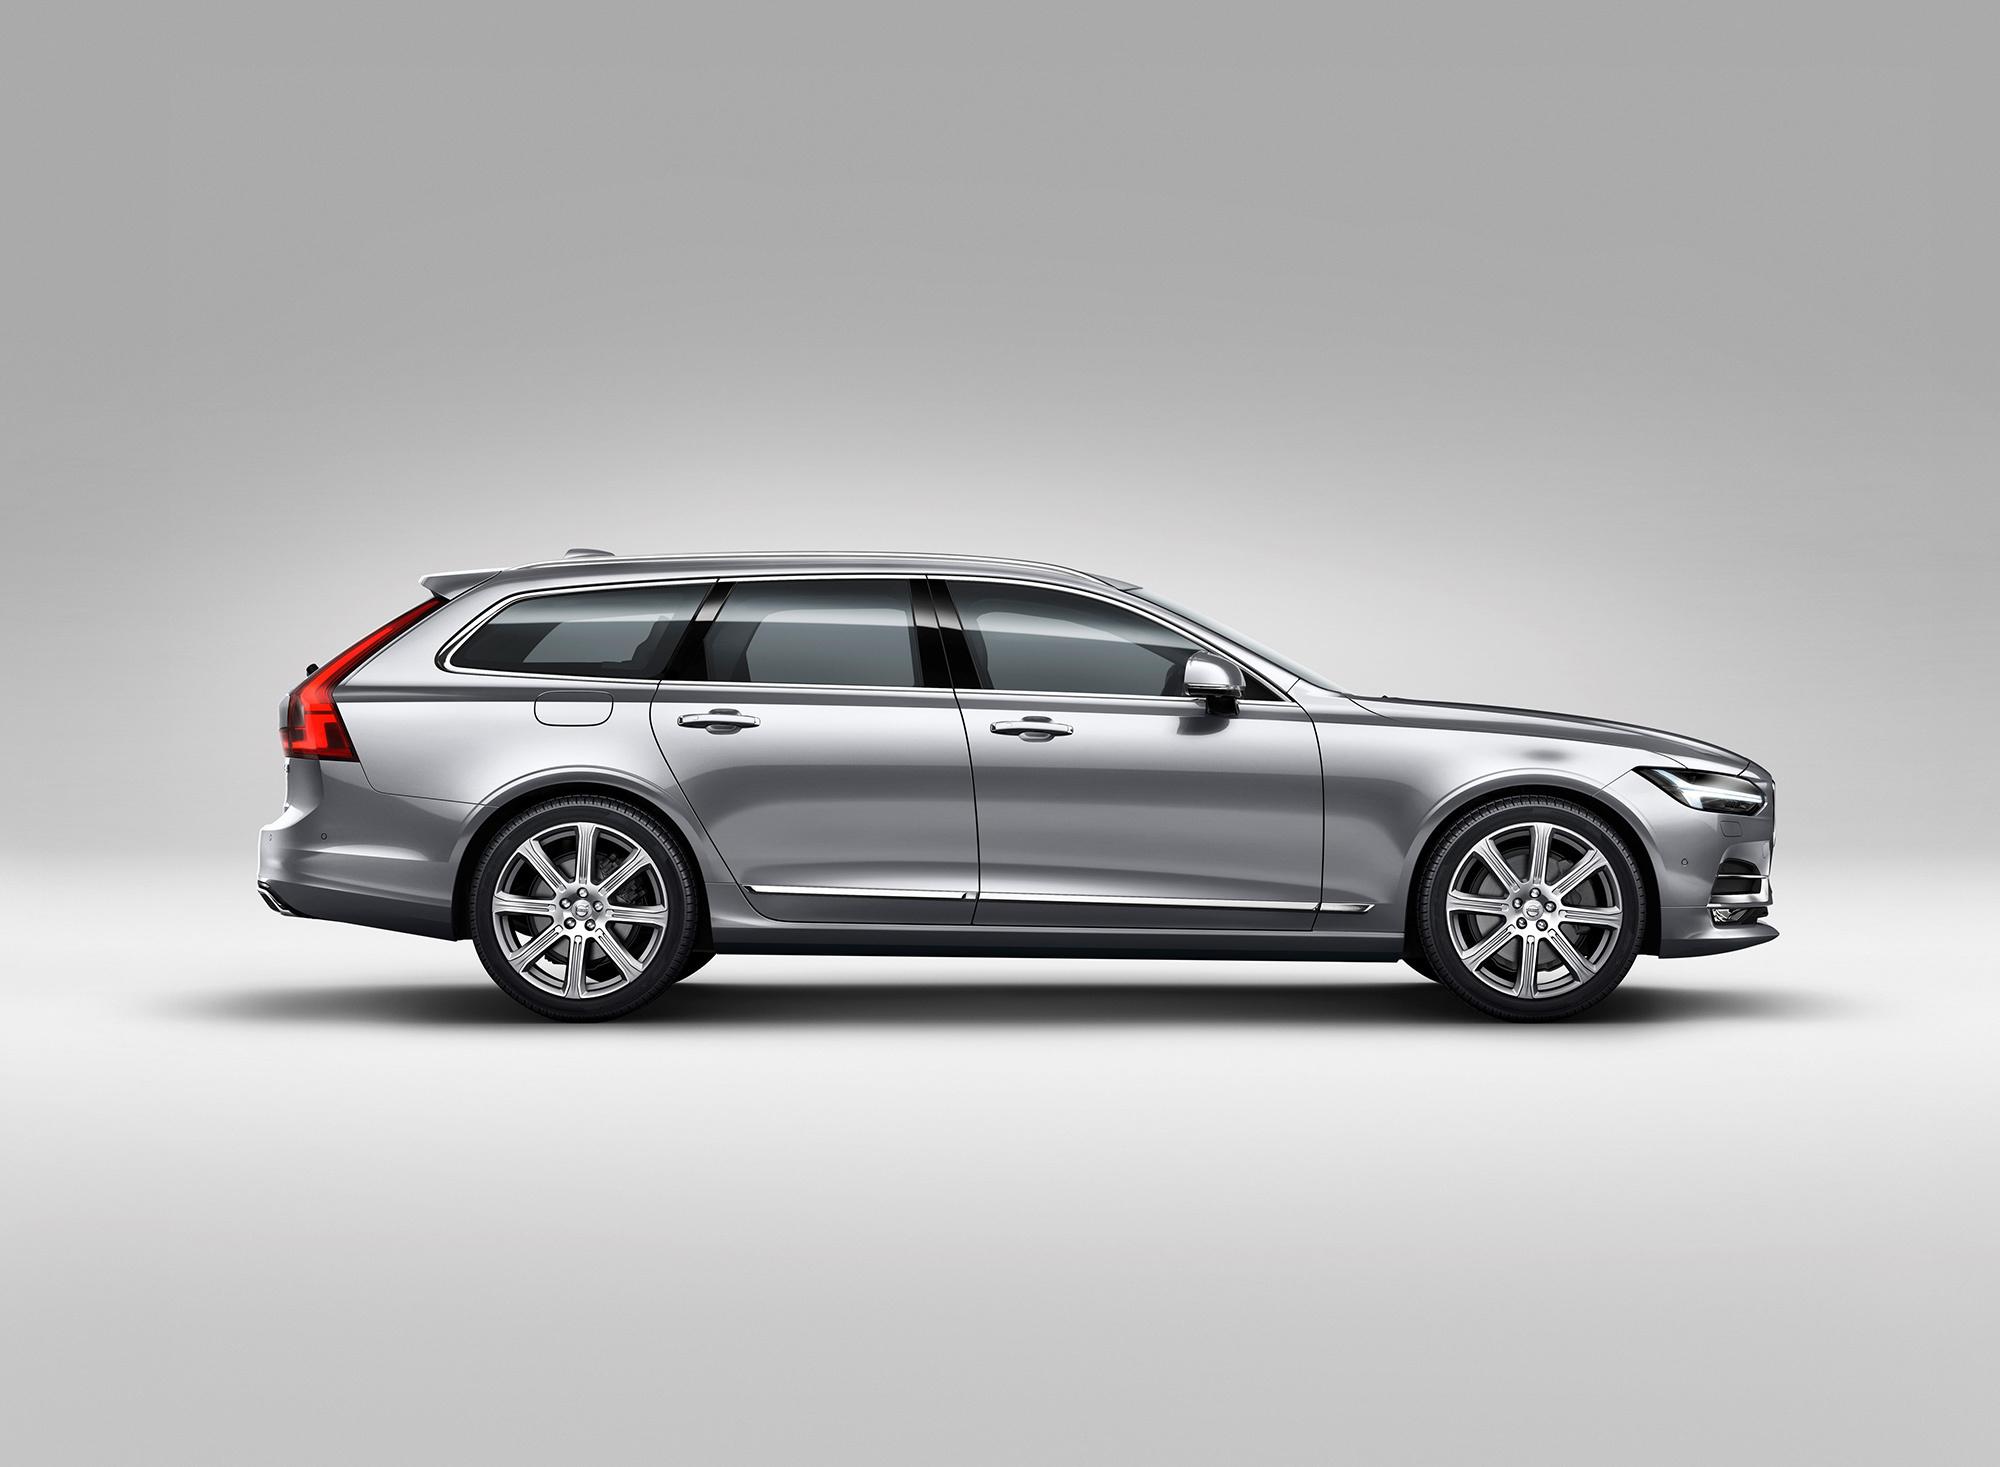 Volvo V90 Pictures